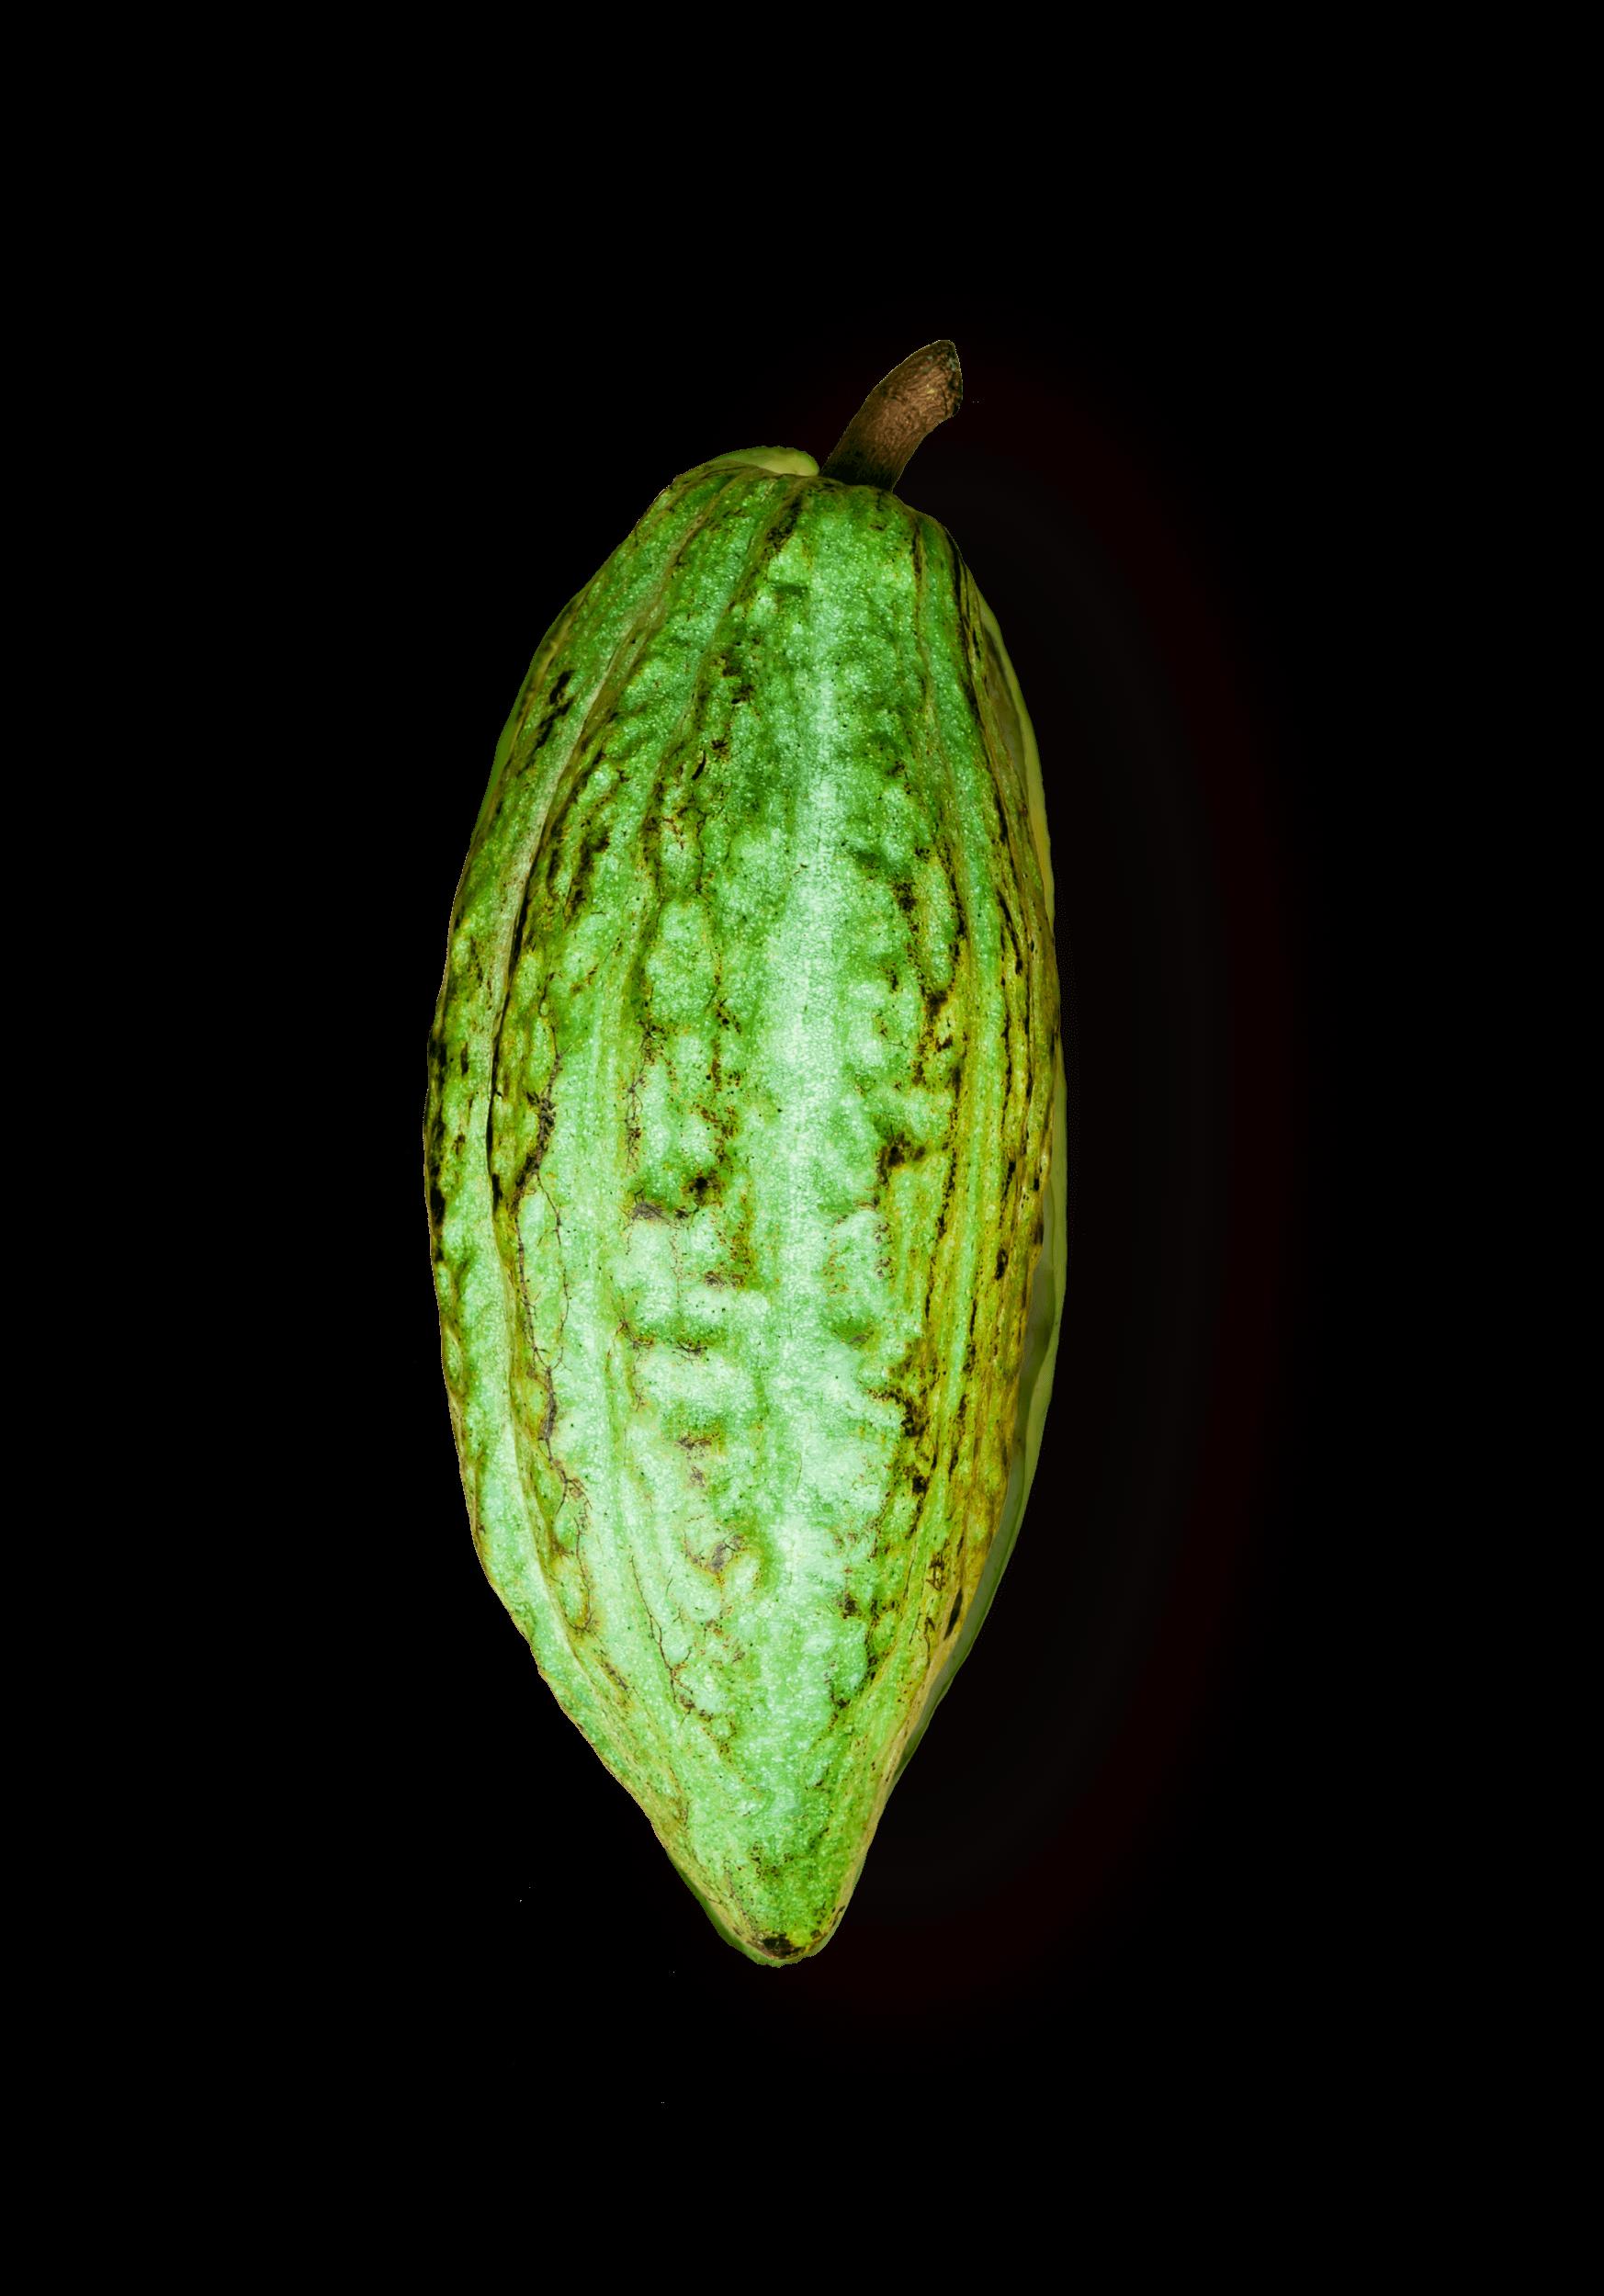 Criollo kakao pupa